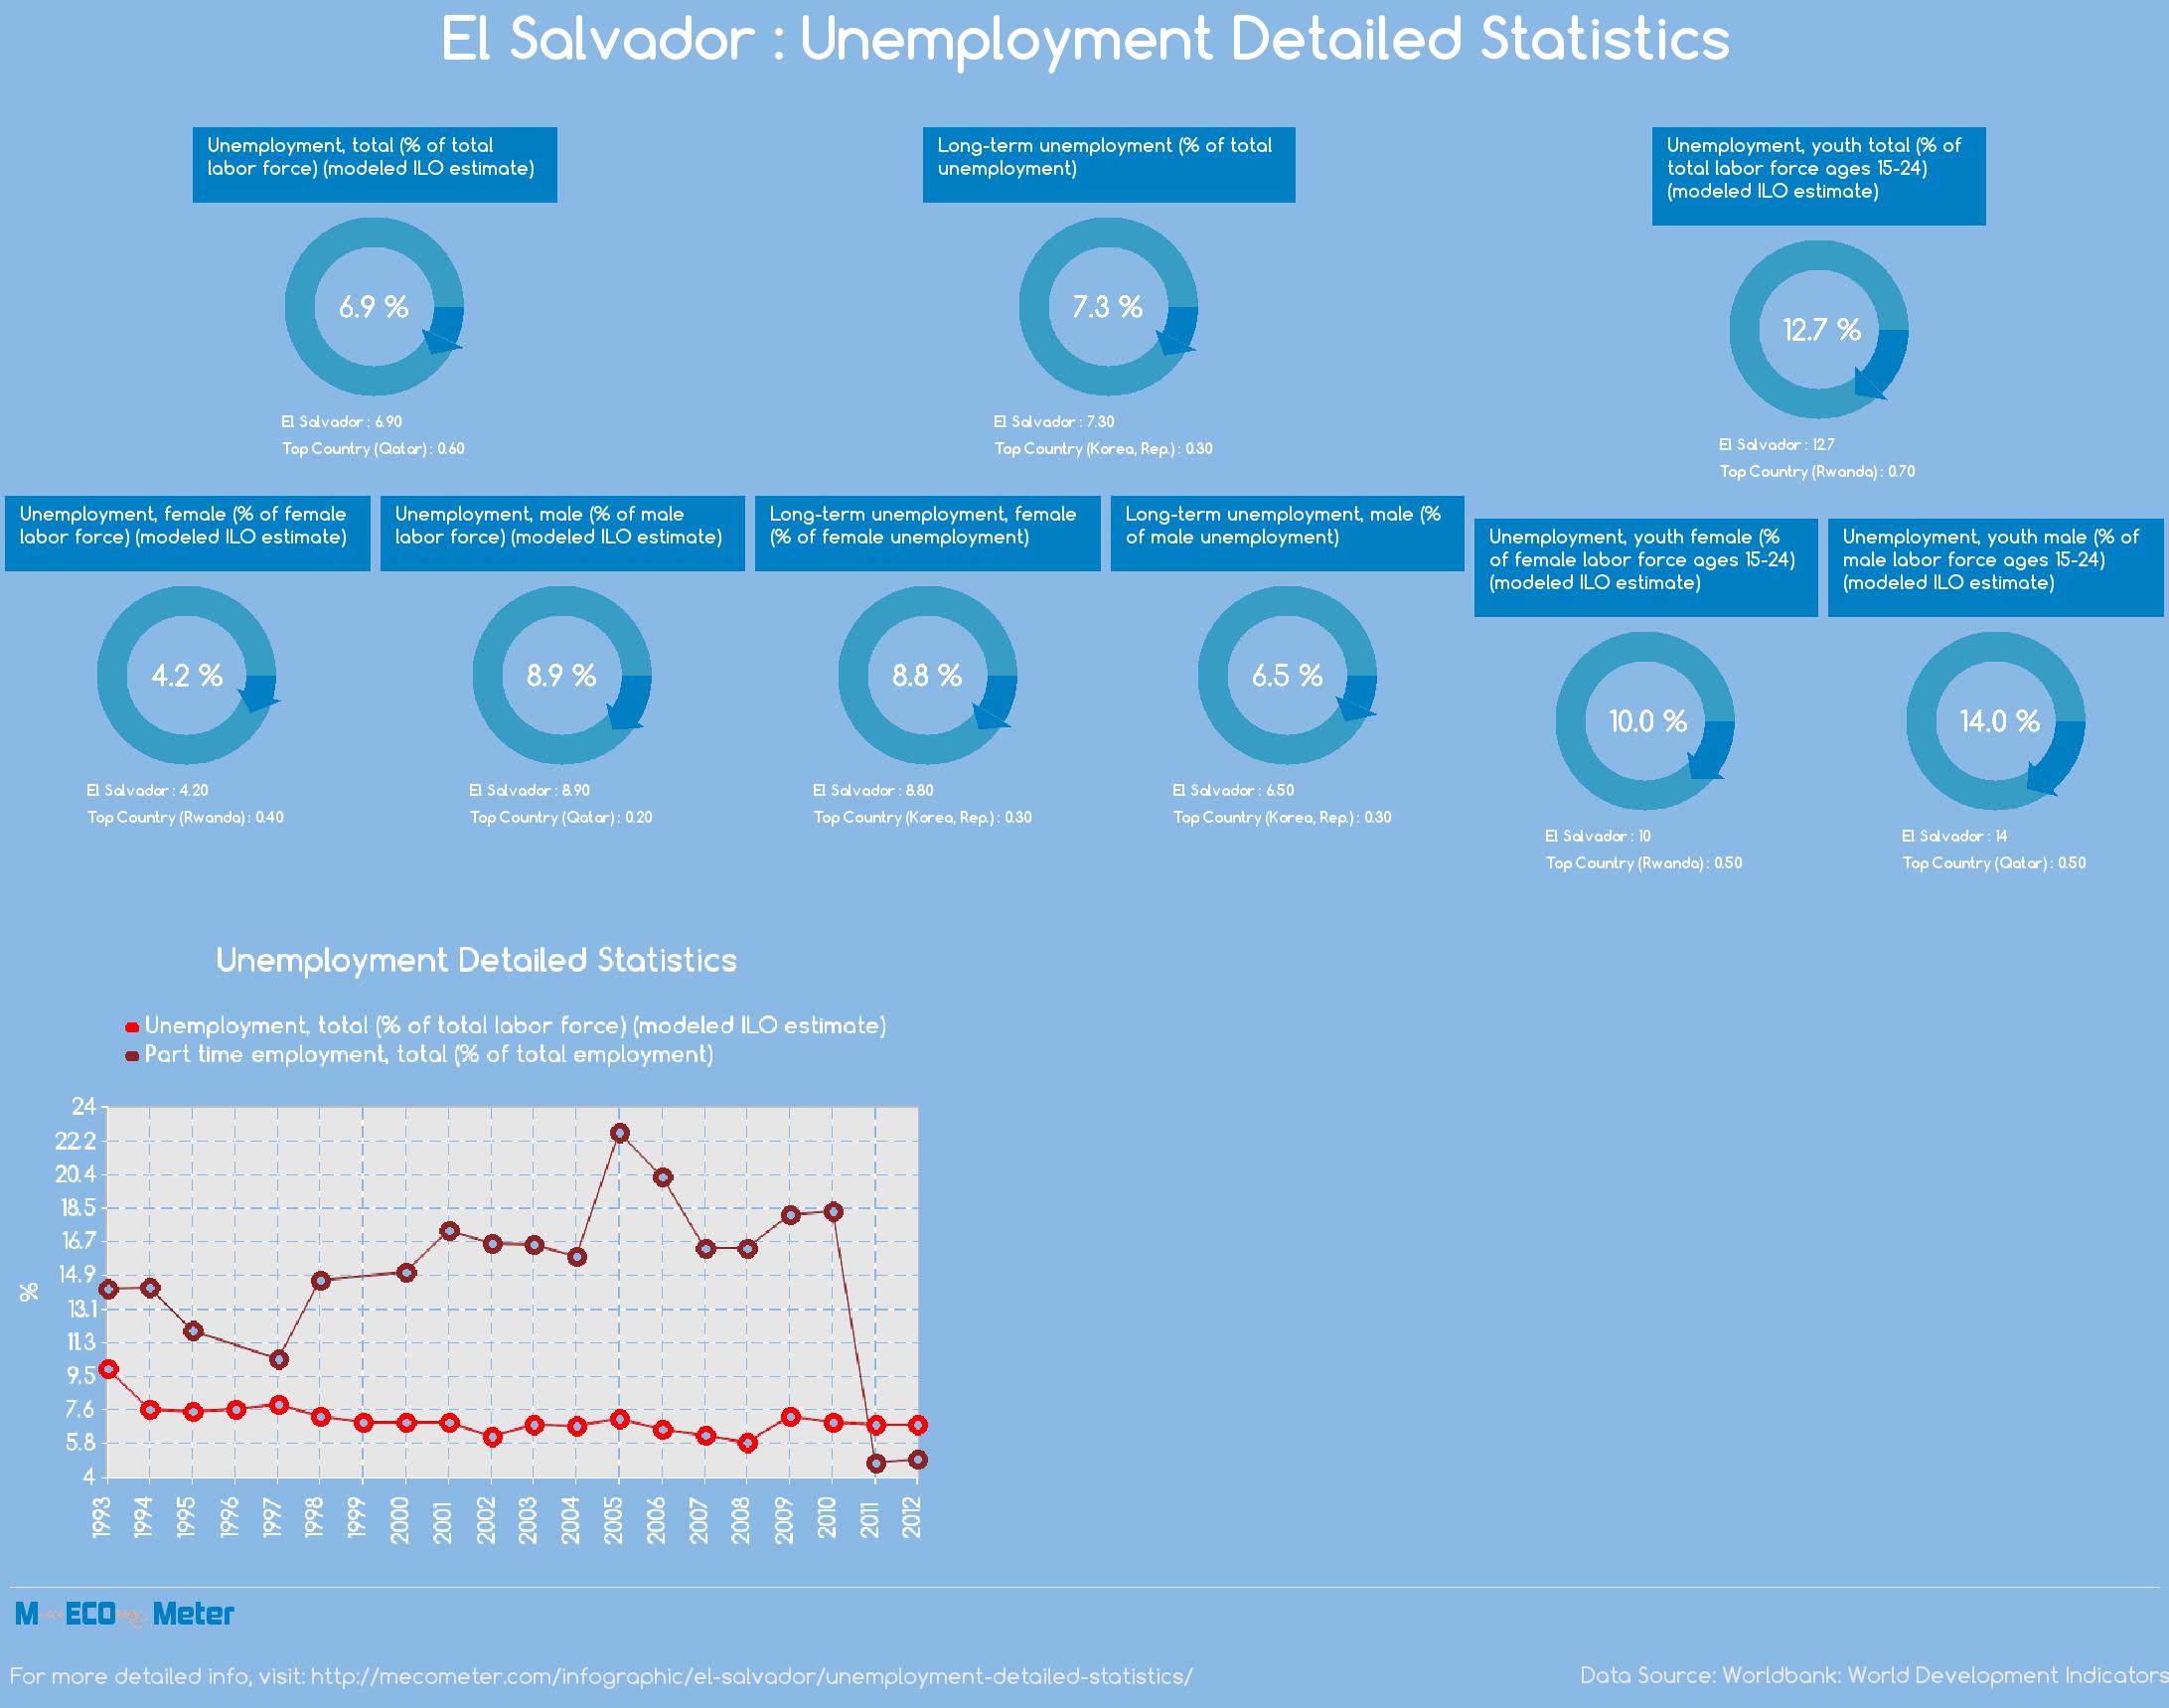 El Salvador : Unemployment Detailed Statistics